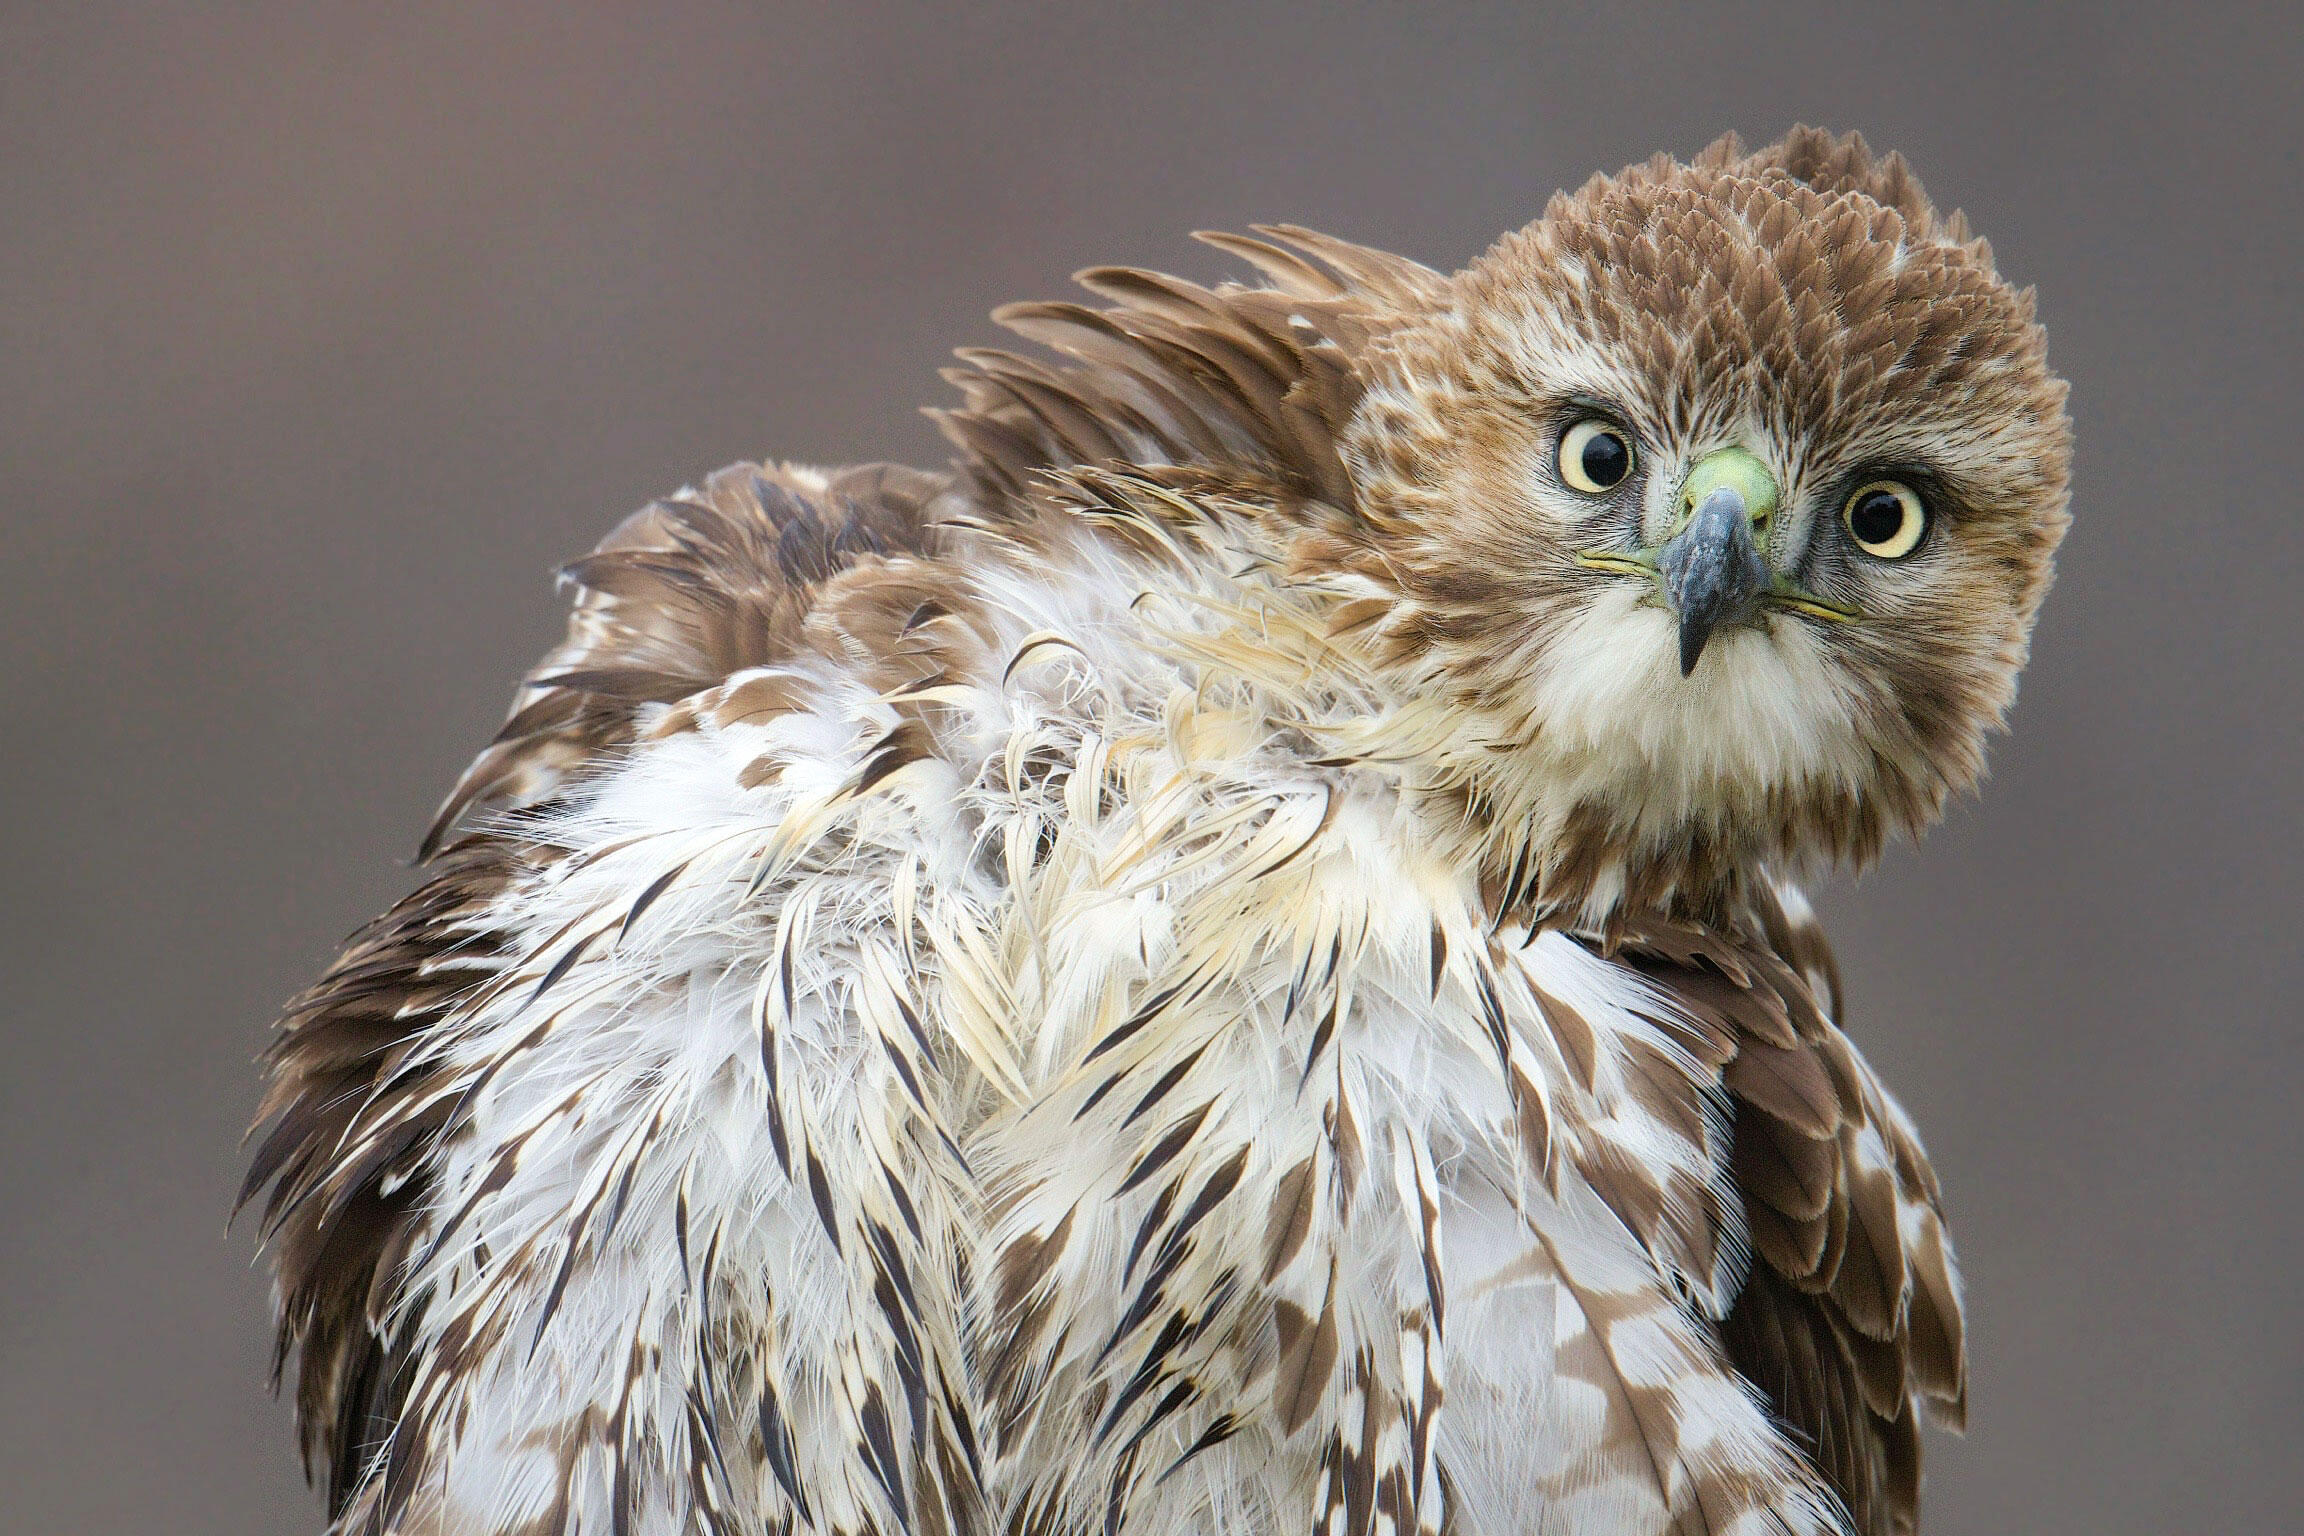 Red-tailed Hawk. Kimberley Caruso/Audubon Photography Awards